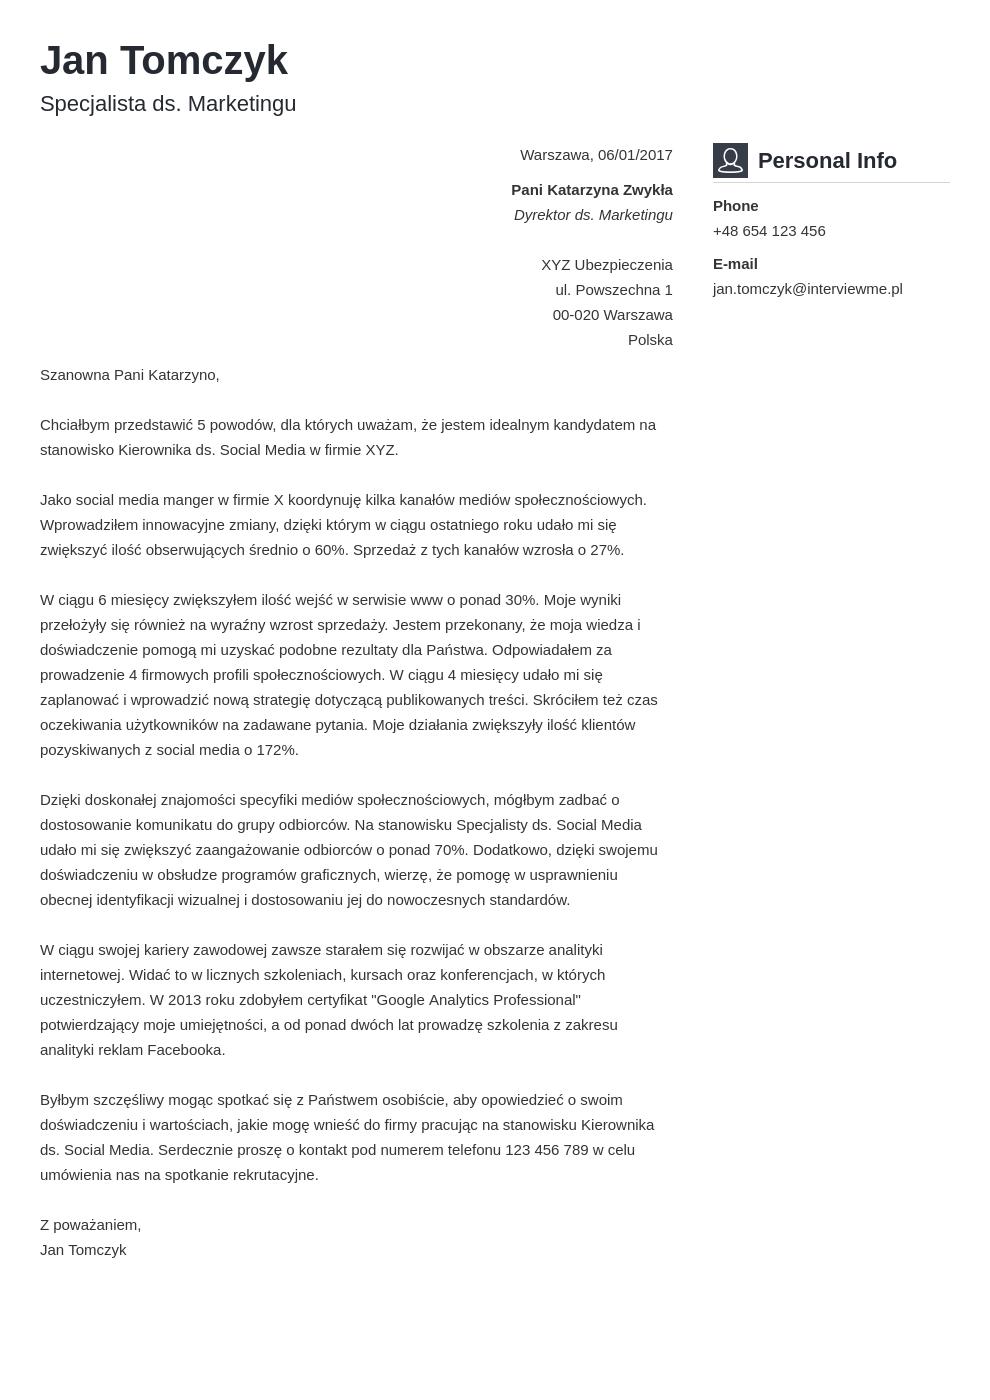 Szablon listu motywacyjnego Vibes